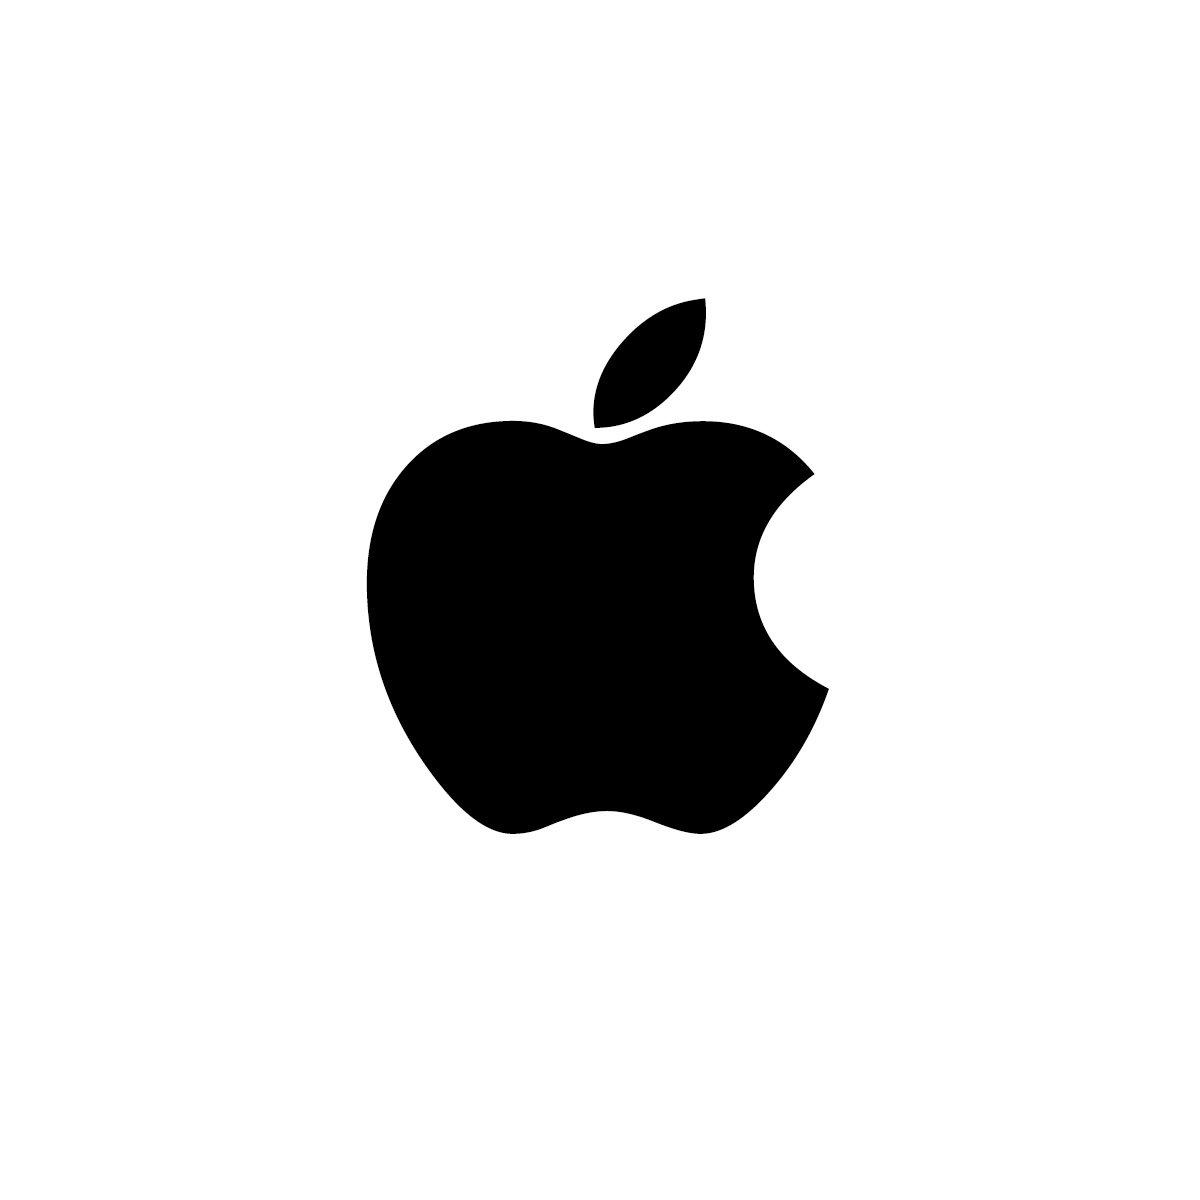 Apple Fransa'dan Rekor Ceza apple Apple Fransa'dan Rekor Ceza og 4